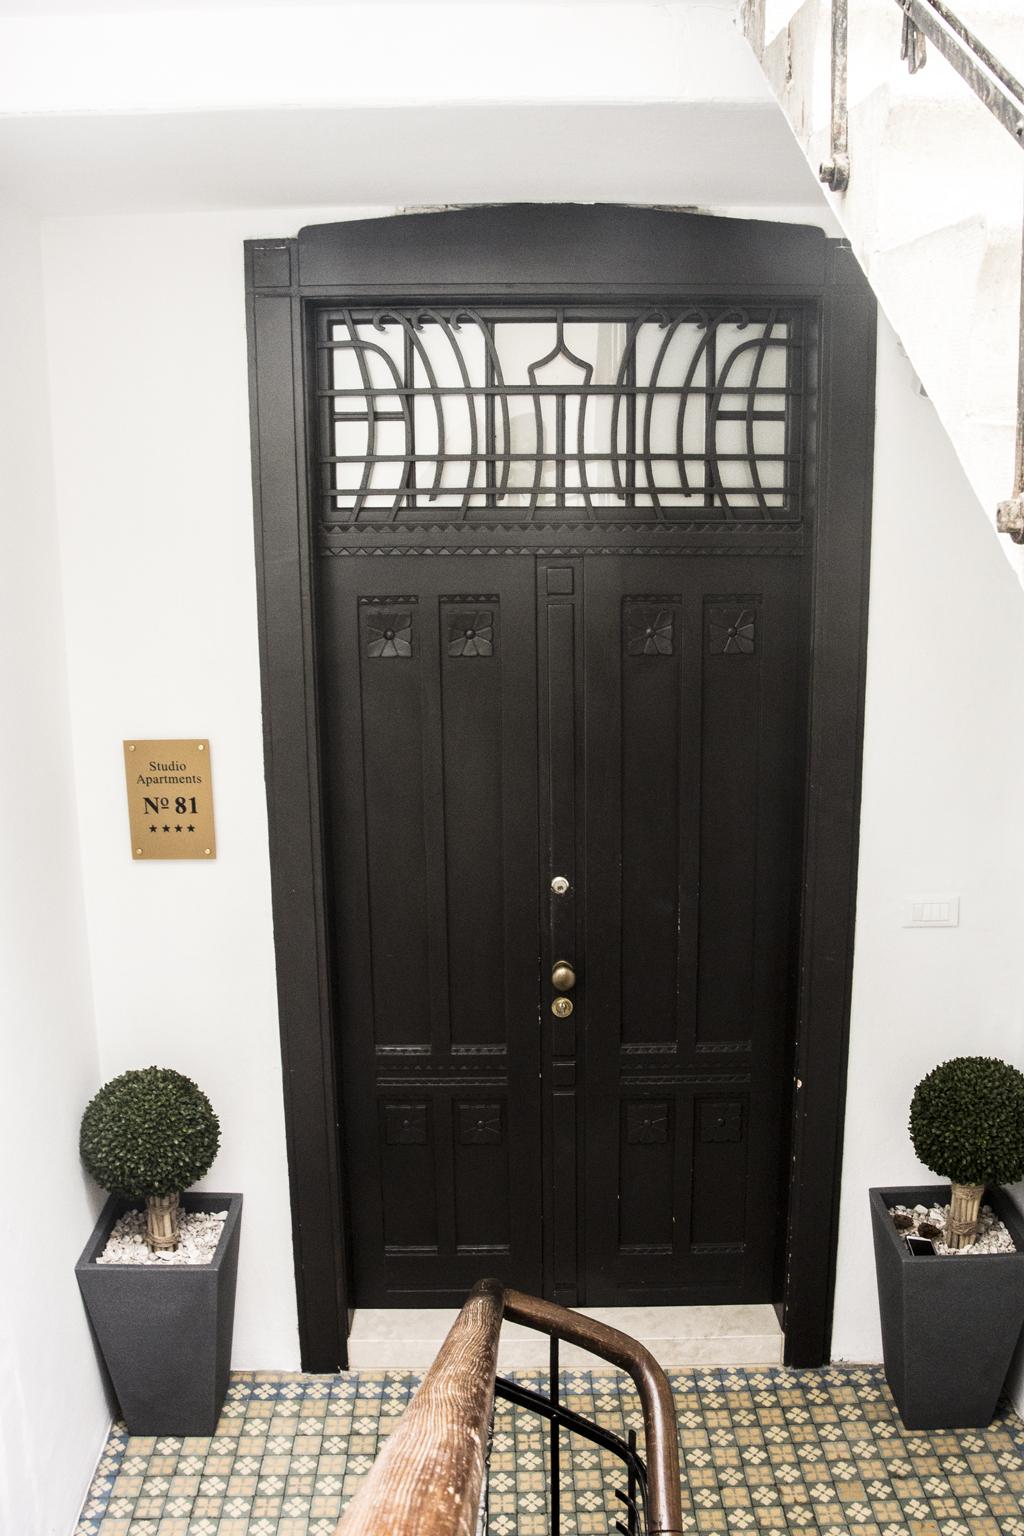 Entrée studio no. 81